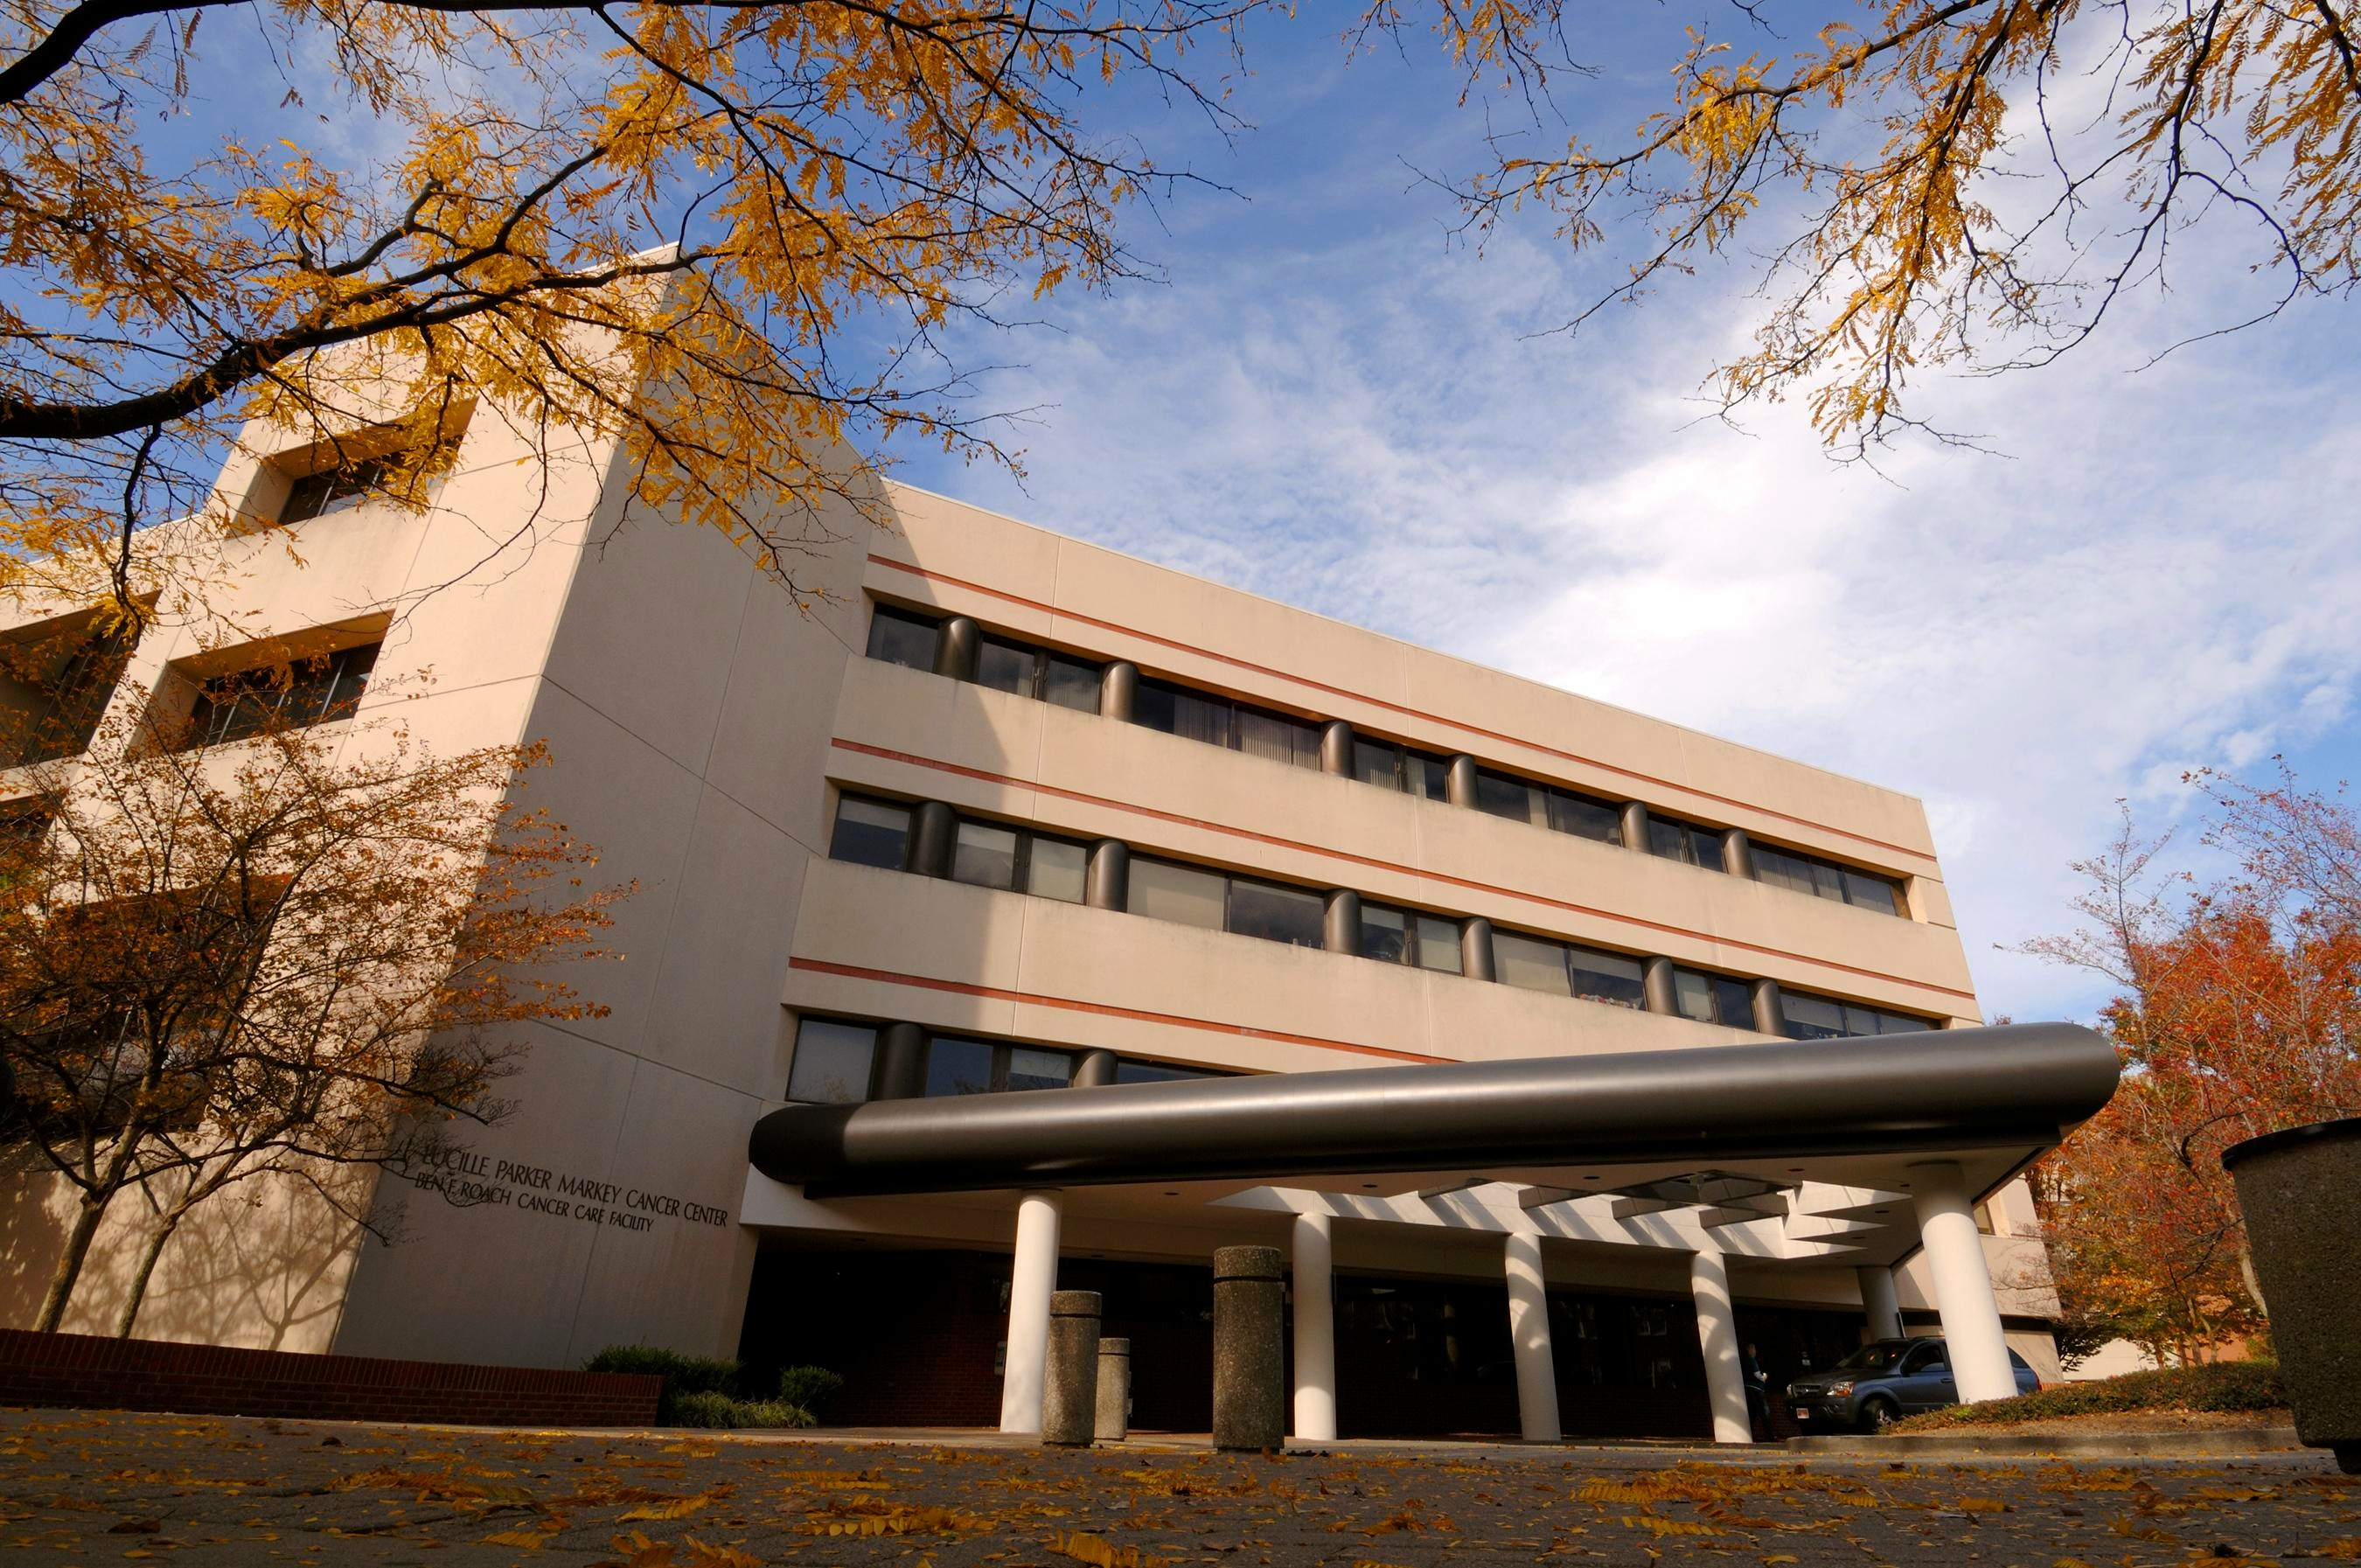 Markey Cancer Foundation (Not the Markey Cancer Center)